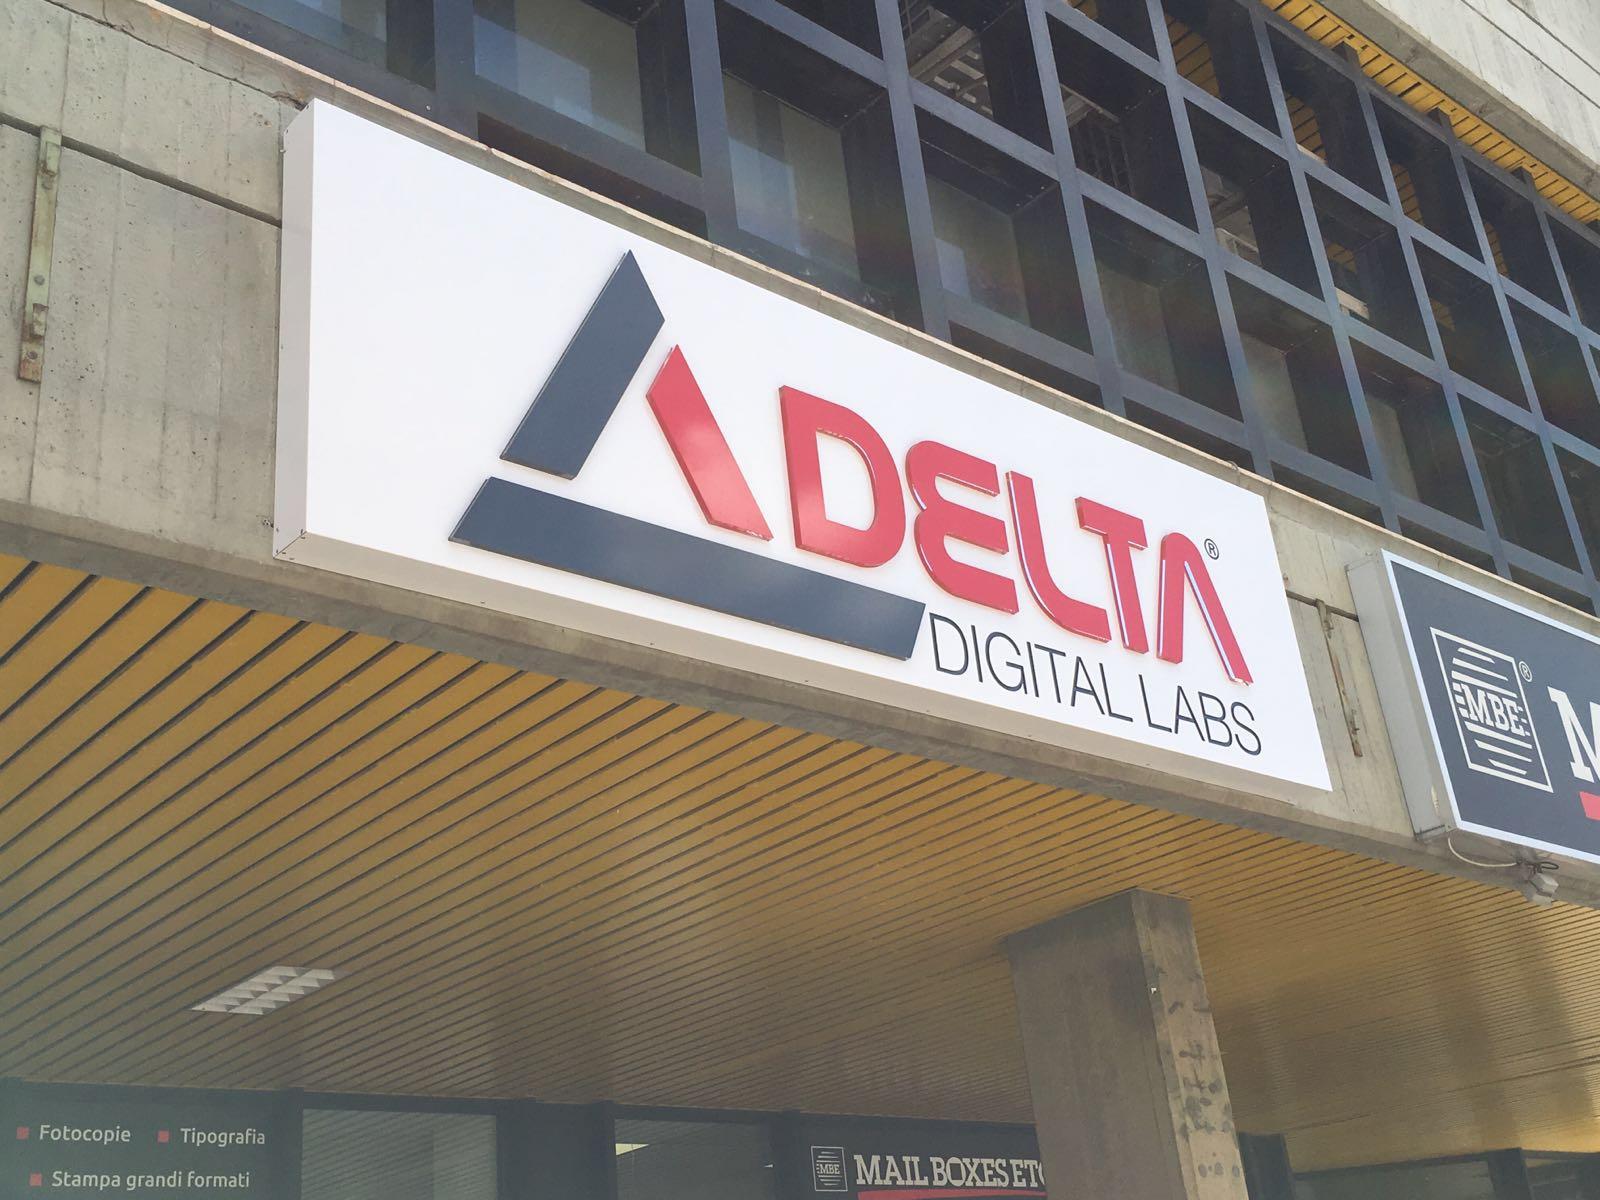 DELTA DIGITAL LABS